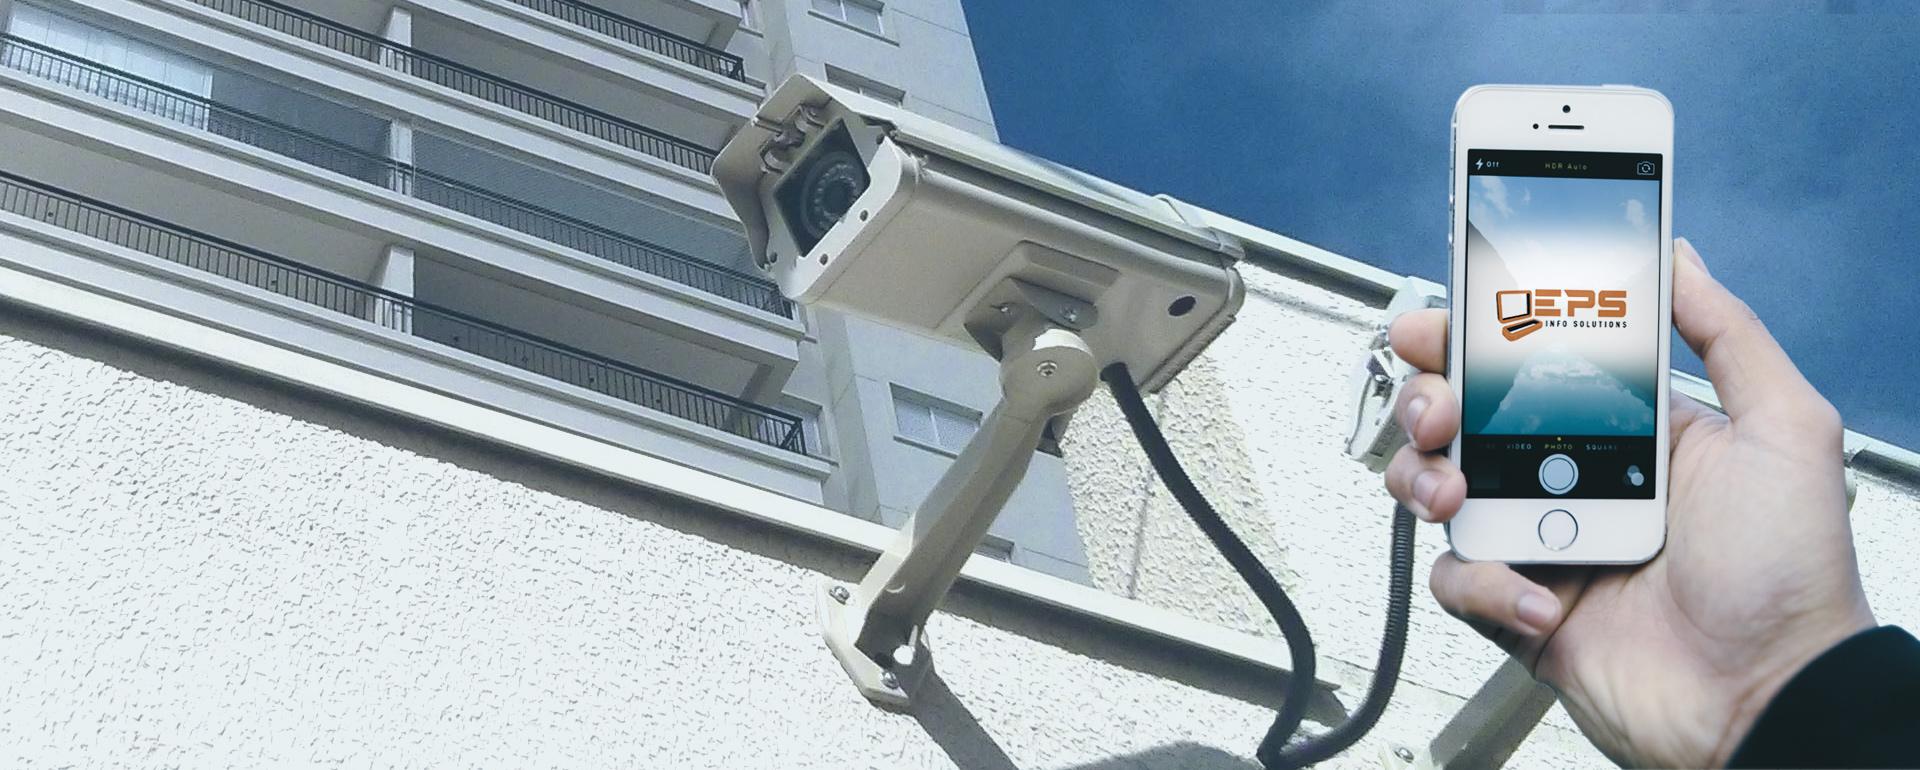 CFTV, alarmes, Interfones